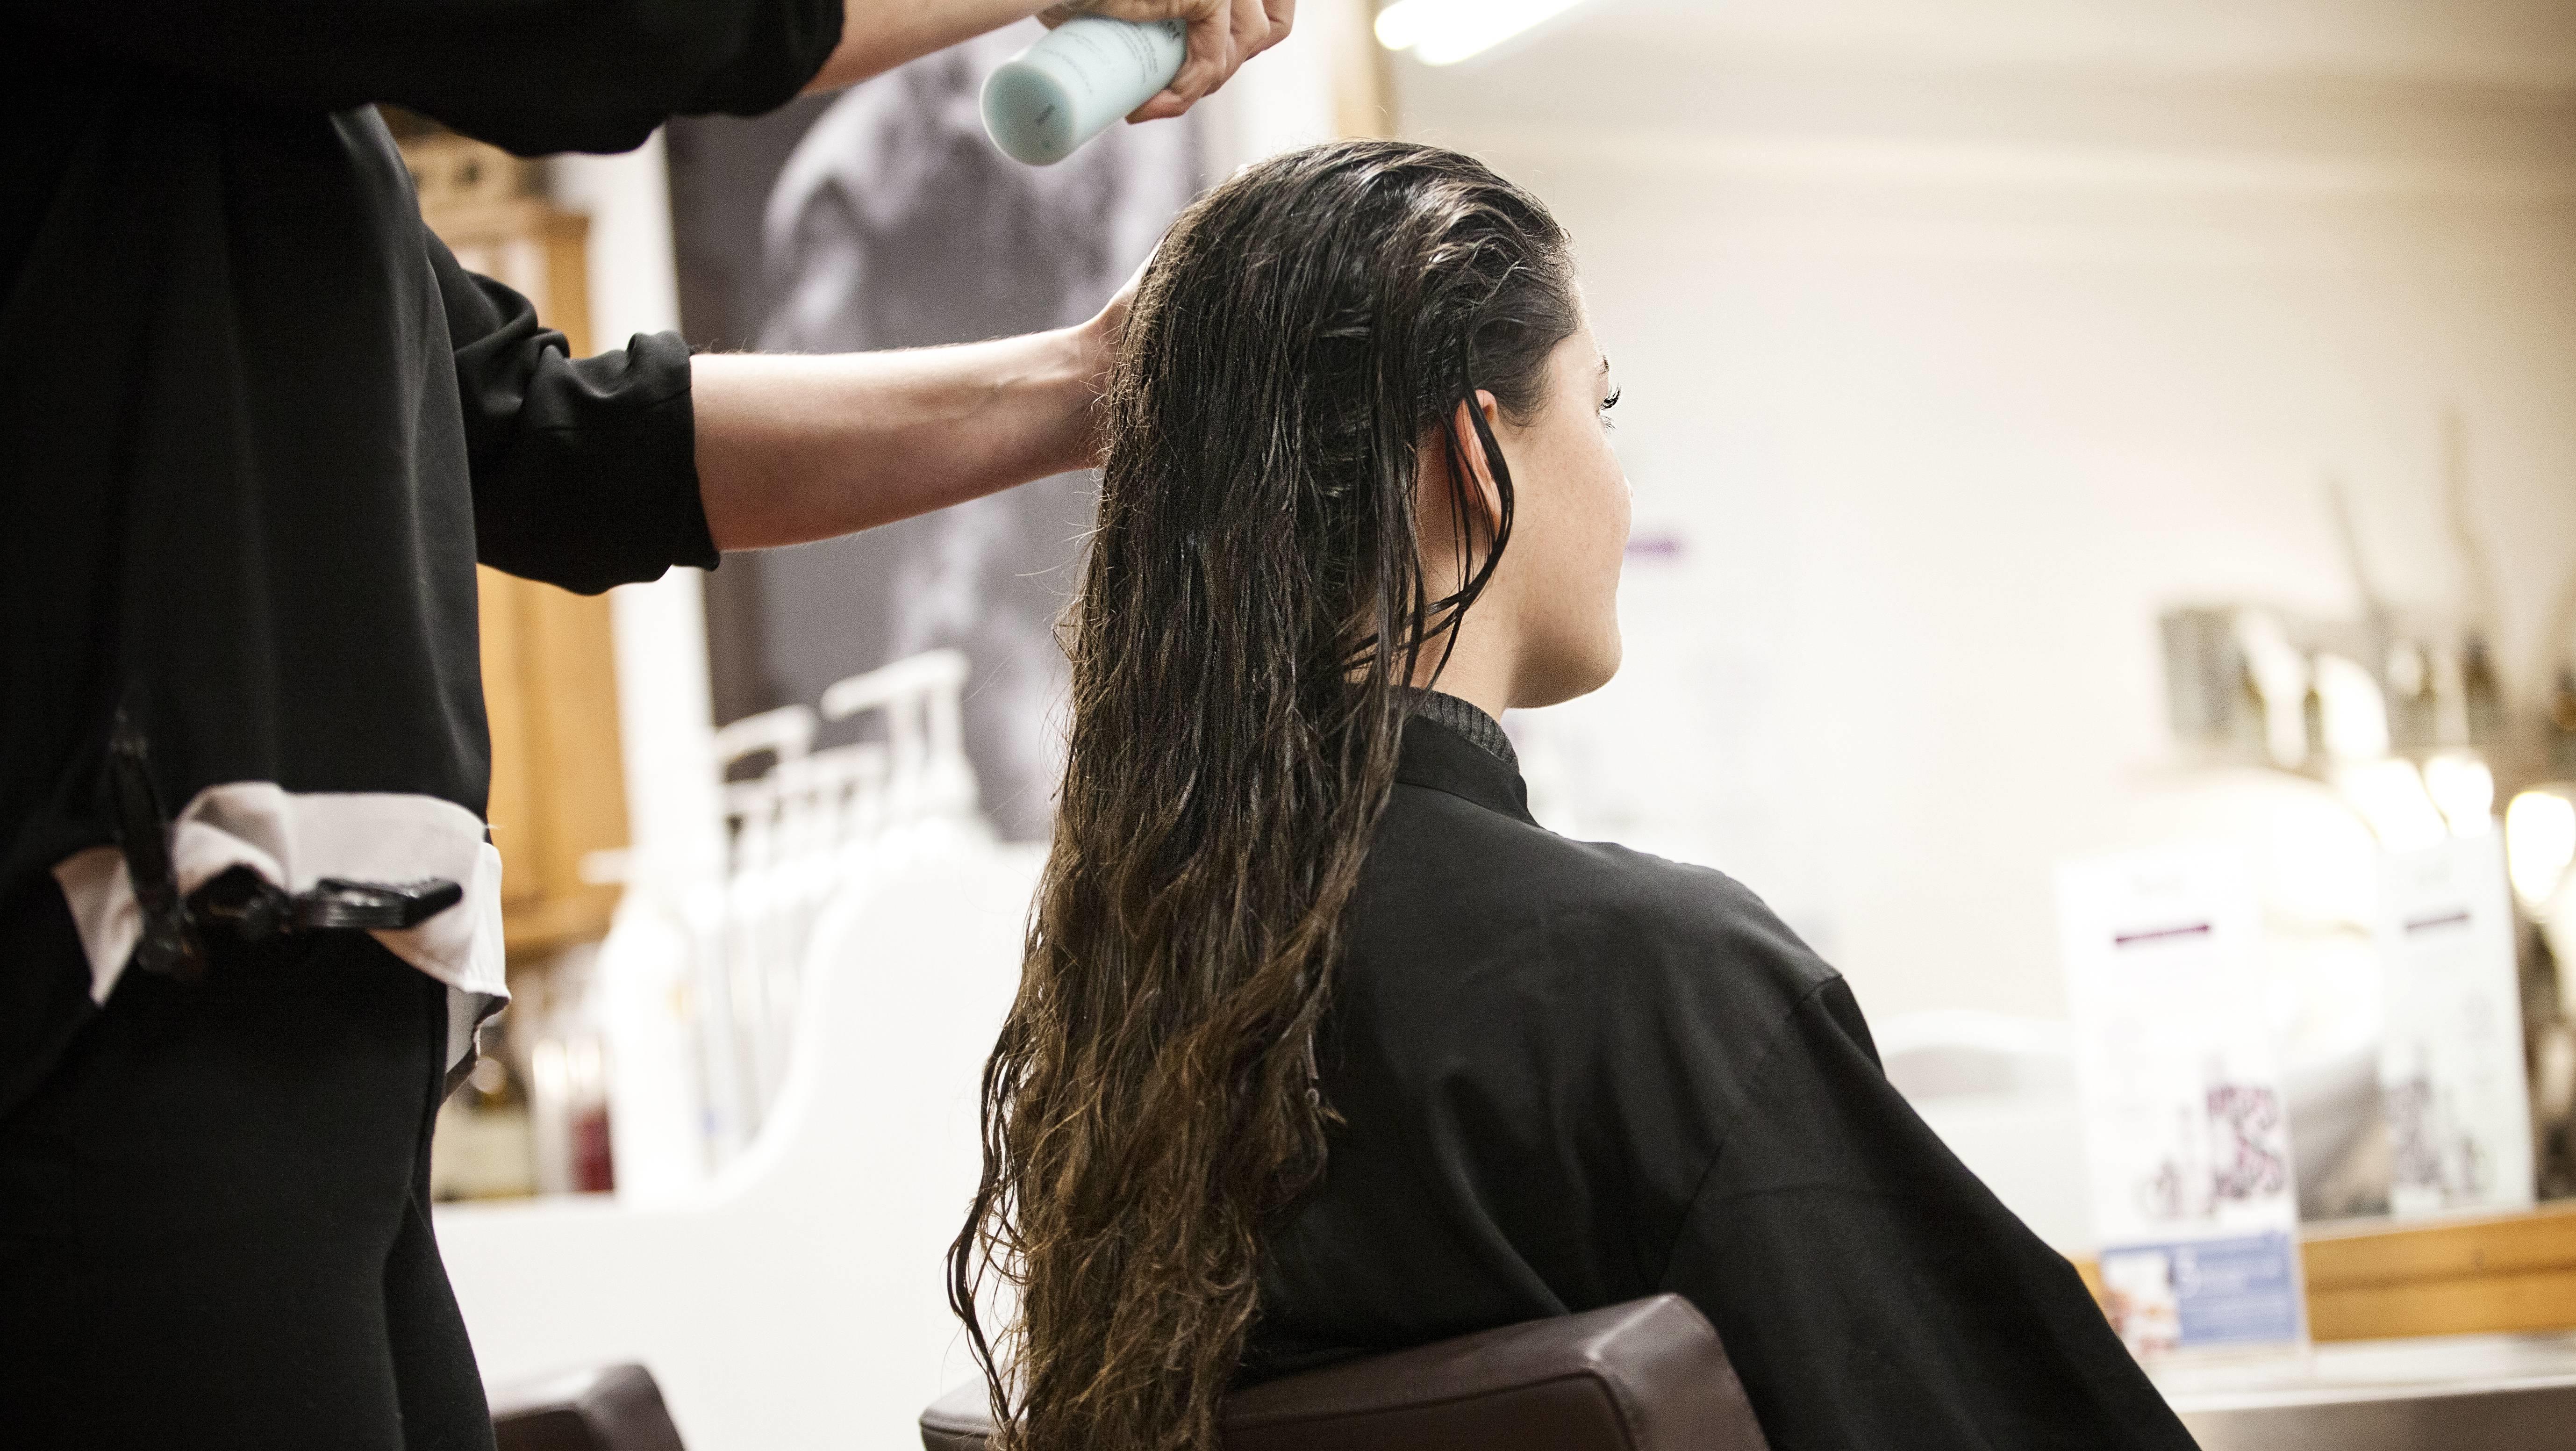 Kundin beim Friseur (Symbolbild)